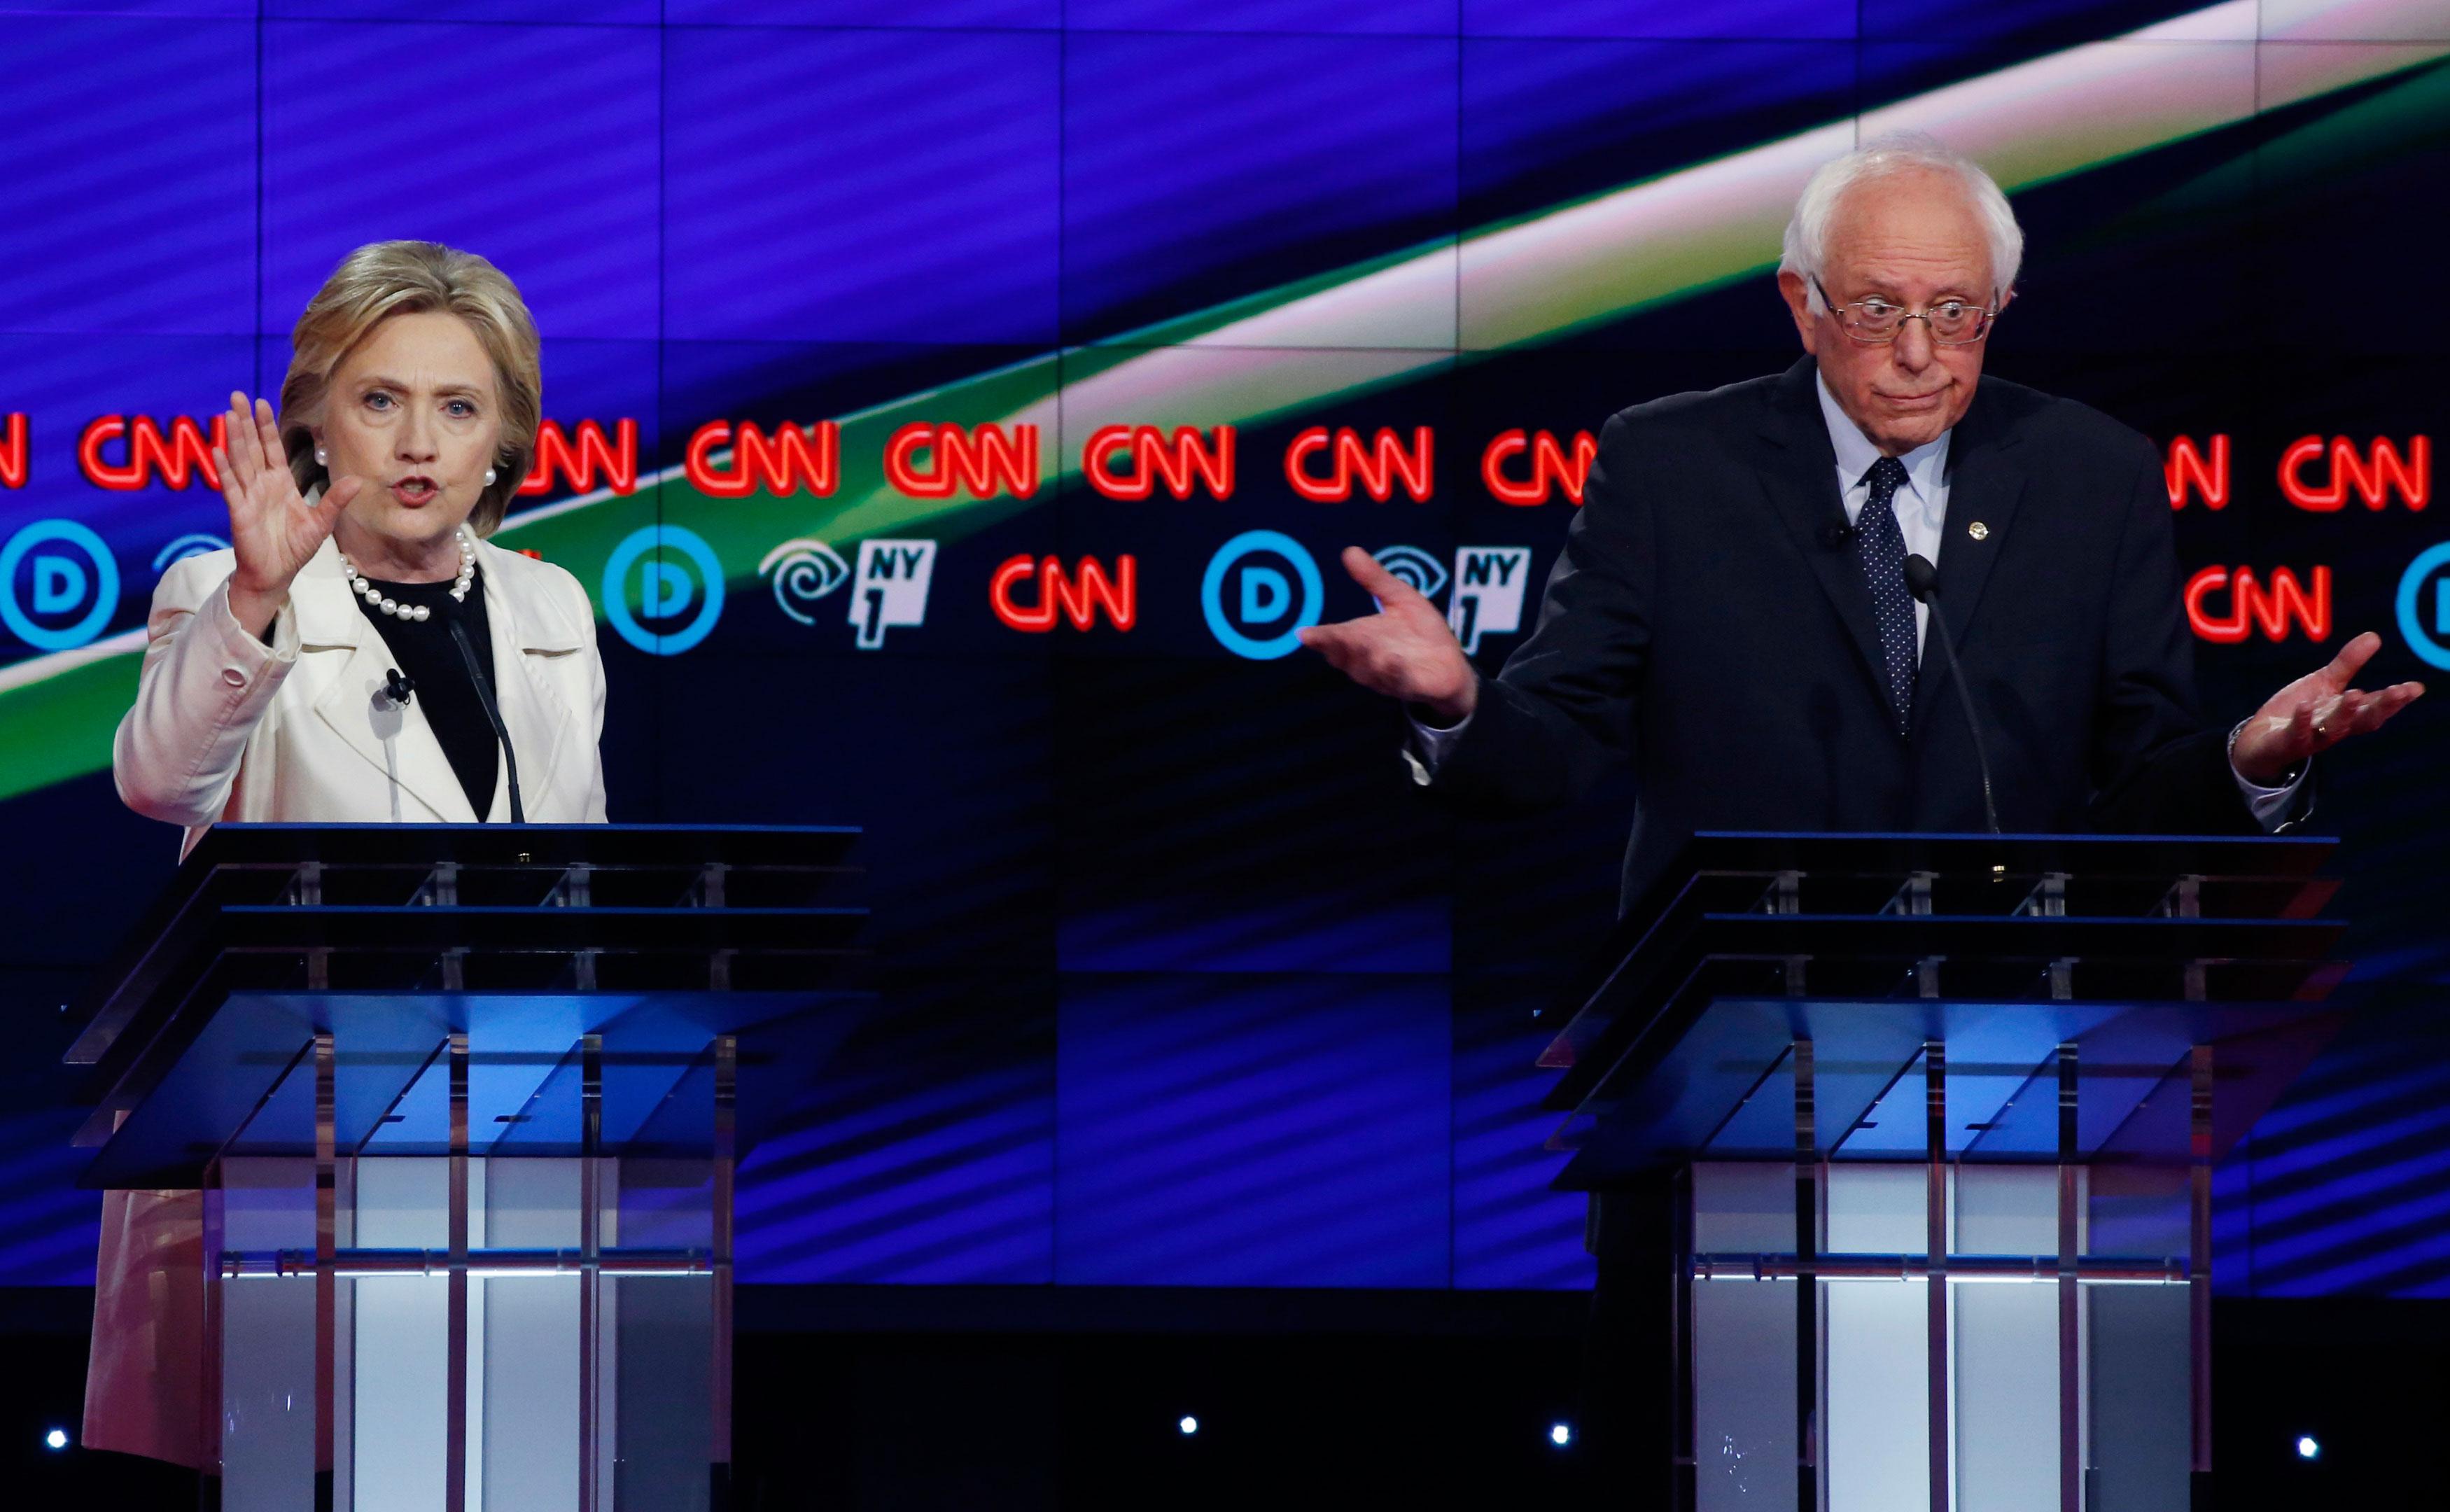 Hillary Clinton and Senator Bernie Sanders during a debate at the Brooklyn Navy Yard, New York, April 14, 2016